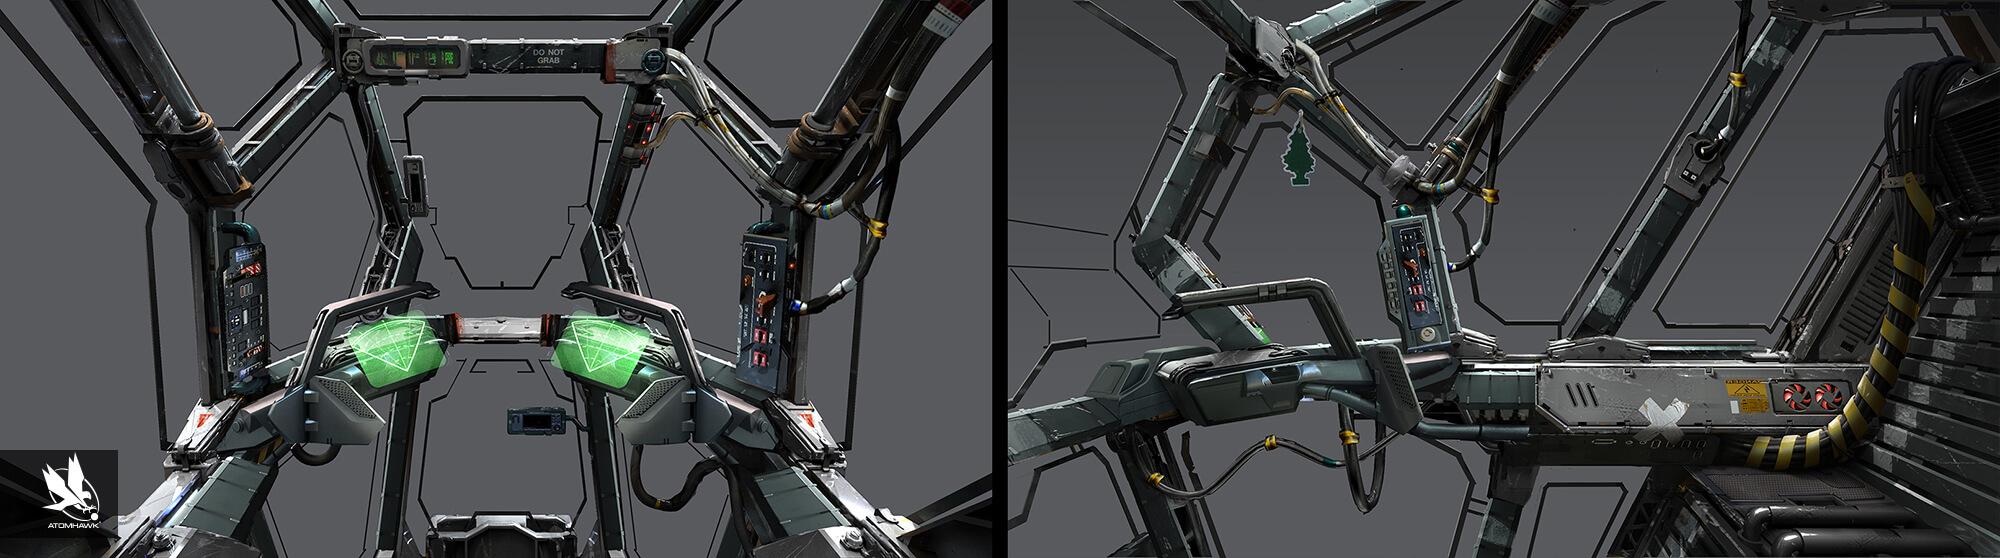 Eve Valkyrie - UI for VR - Spacecraft Design - Cockpit Support